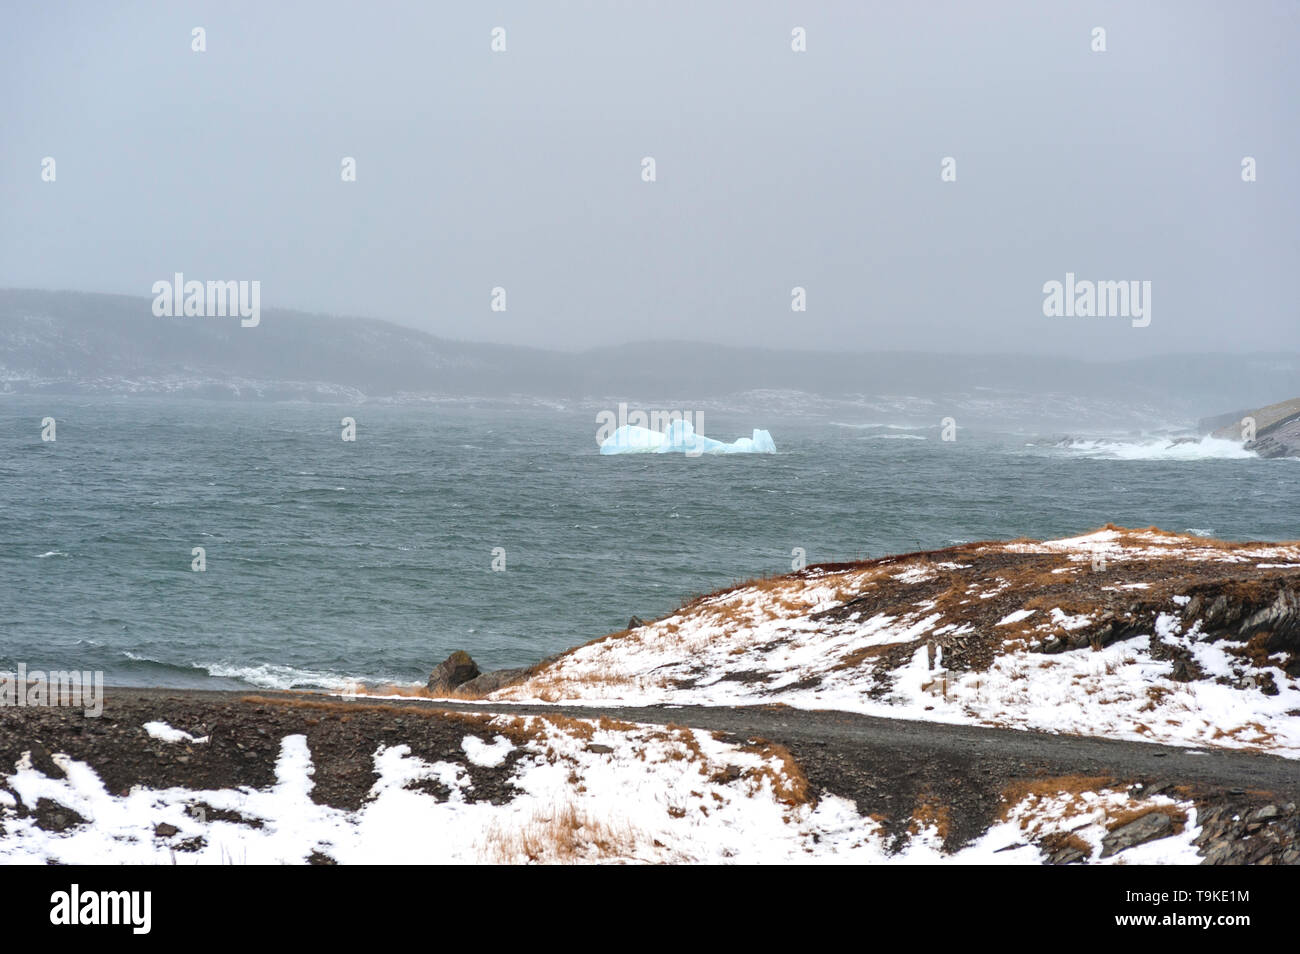 ice berg and rocky shoreline - Stock Image